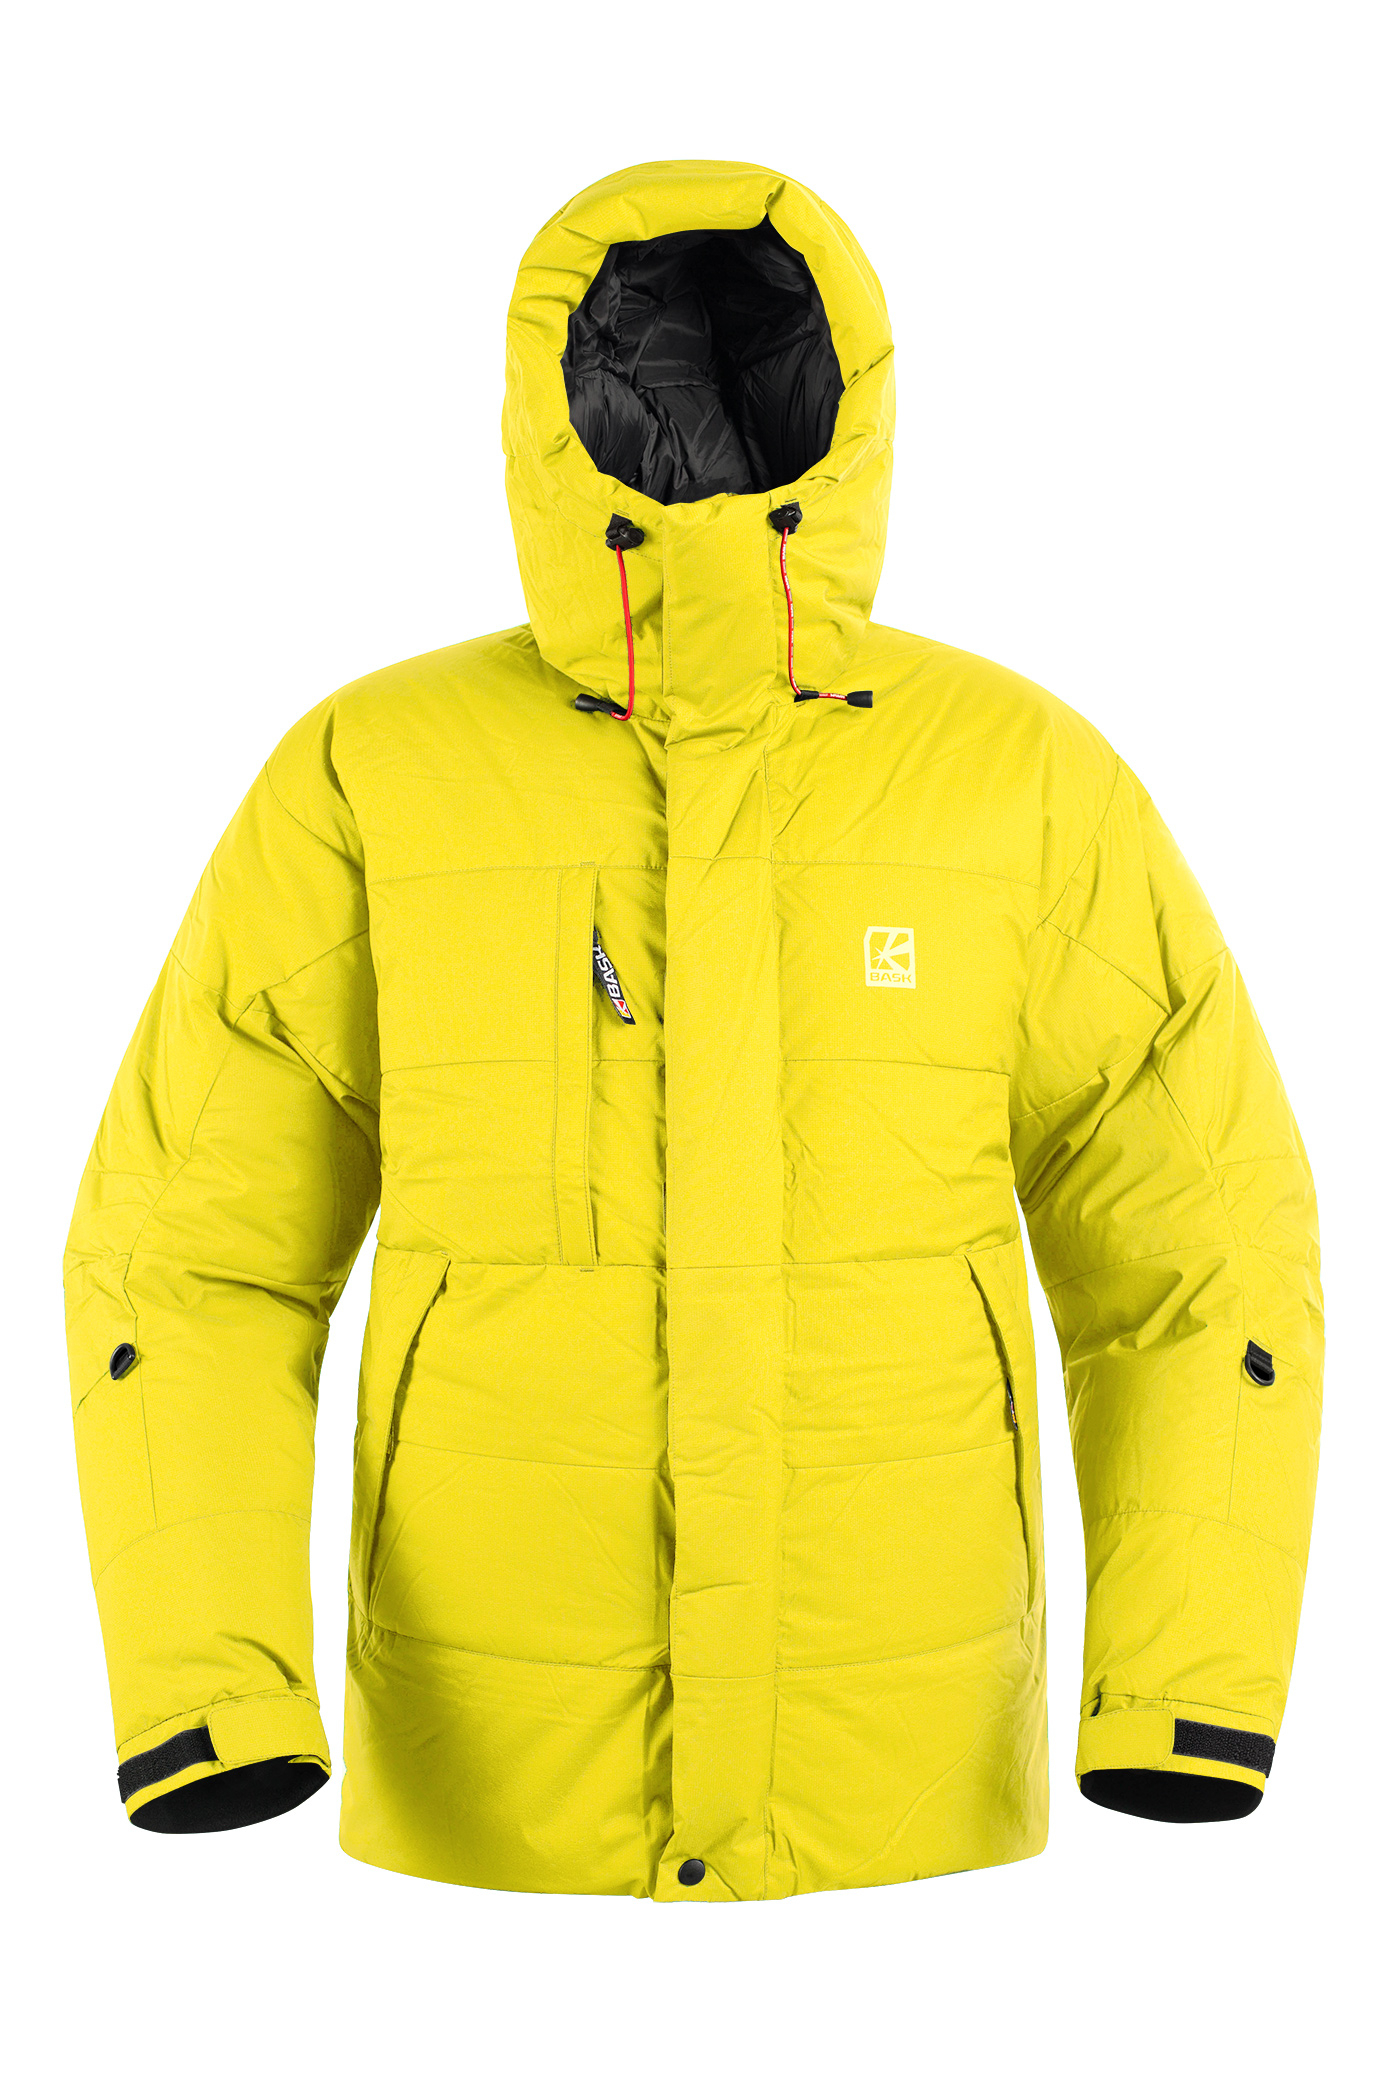 Пуховая куртка БАСК EVEREST V2 фото